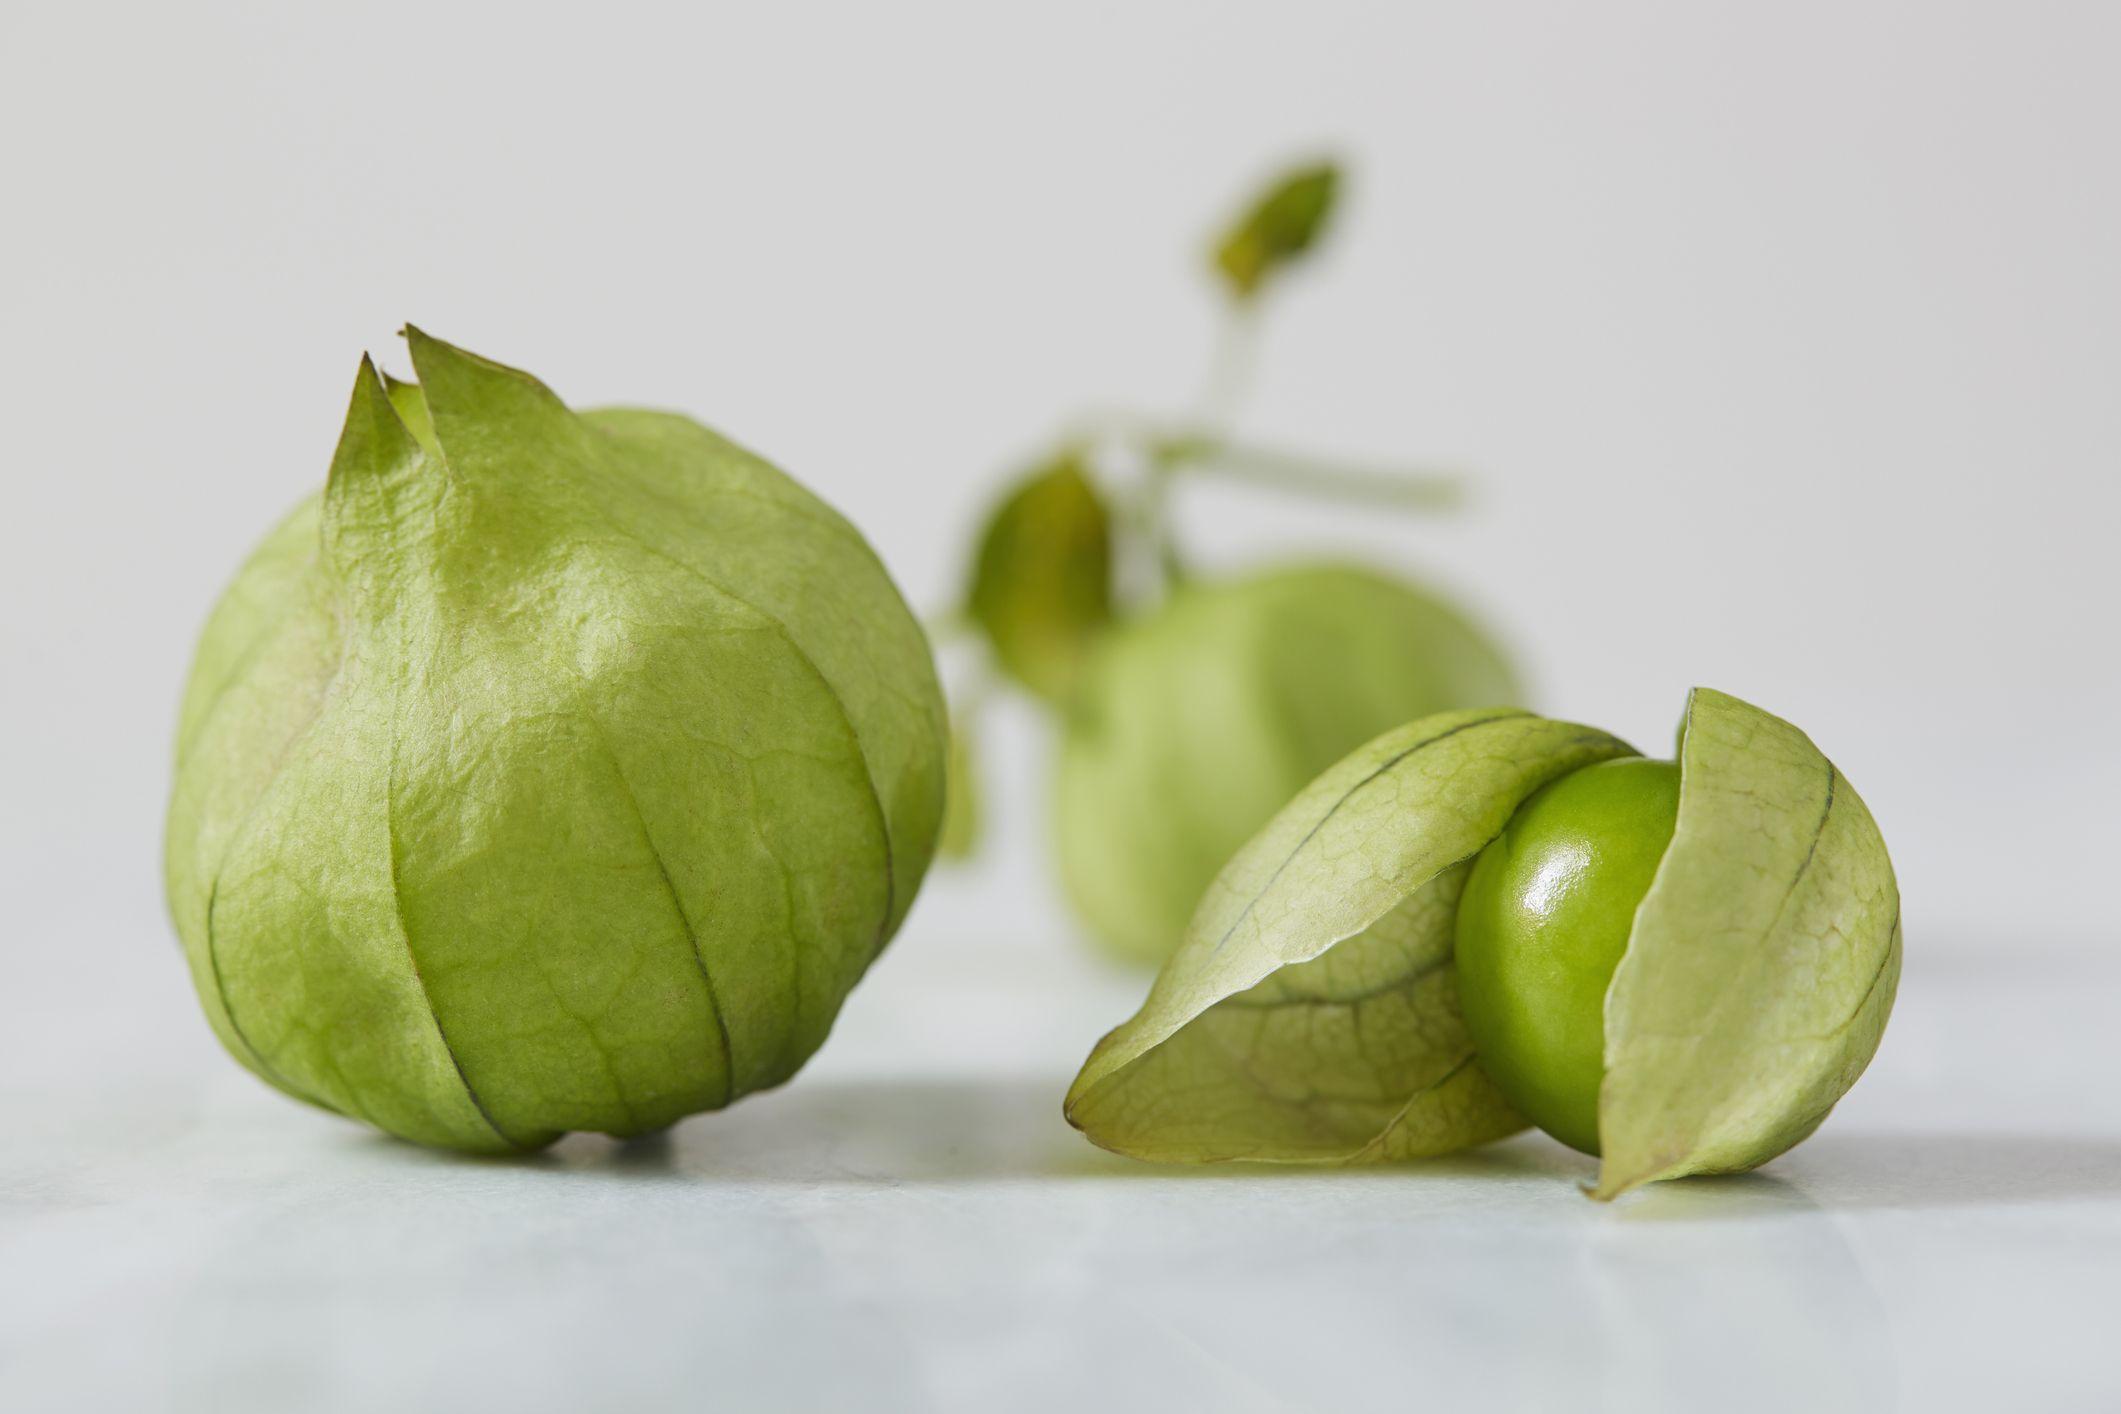 Tomatillo: A Growing Guide